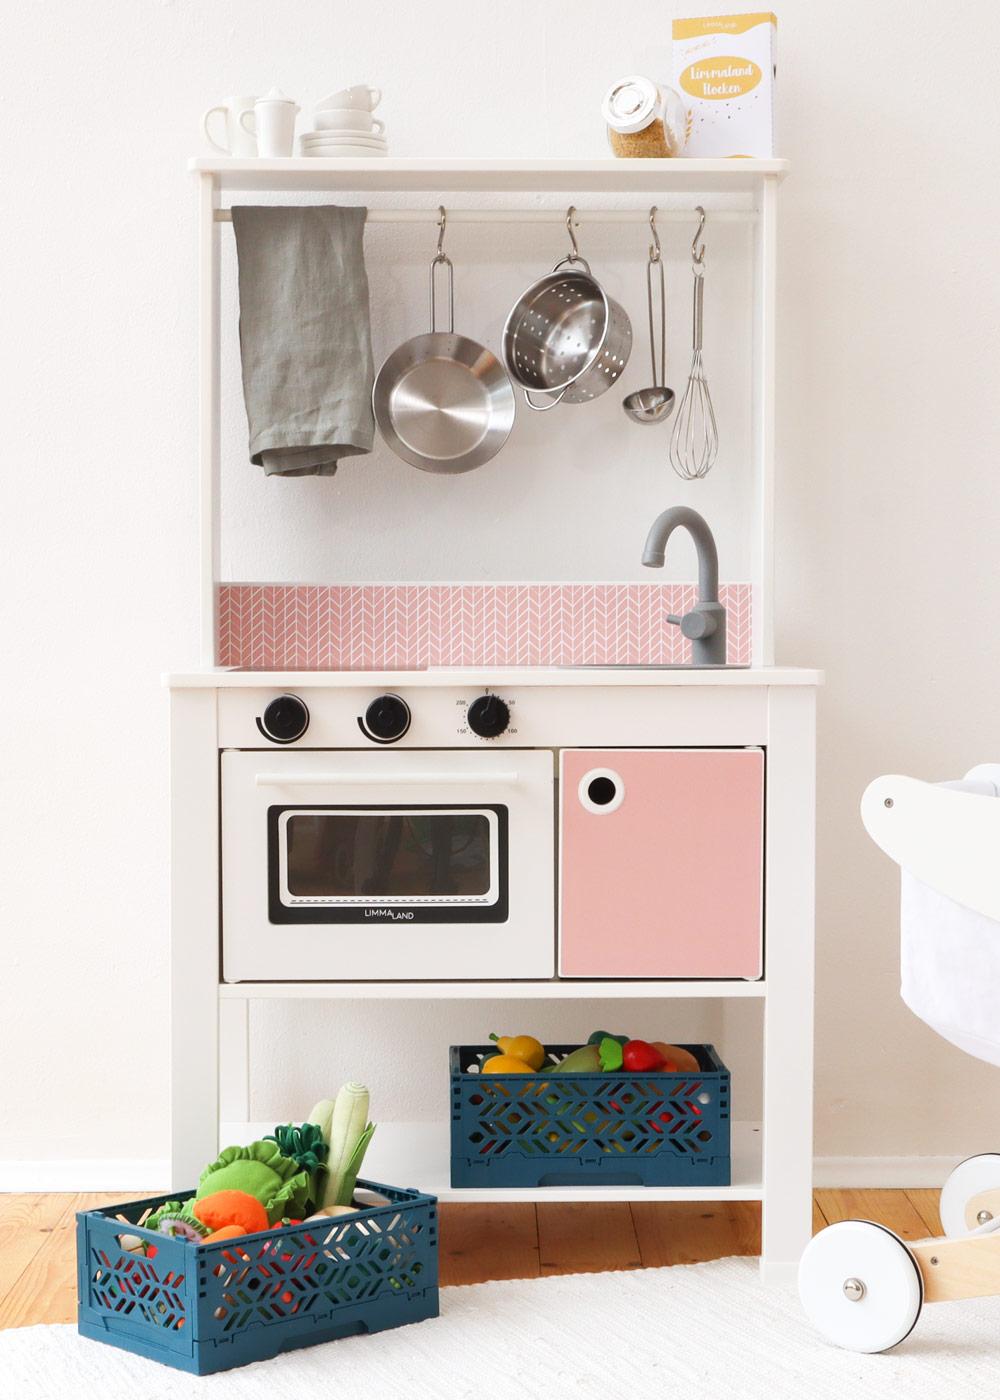 Ikea Spisig Kinderküche Skandig Rosa Gesamtansicht